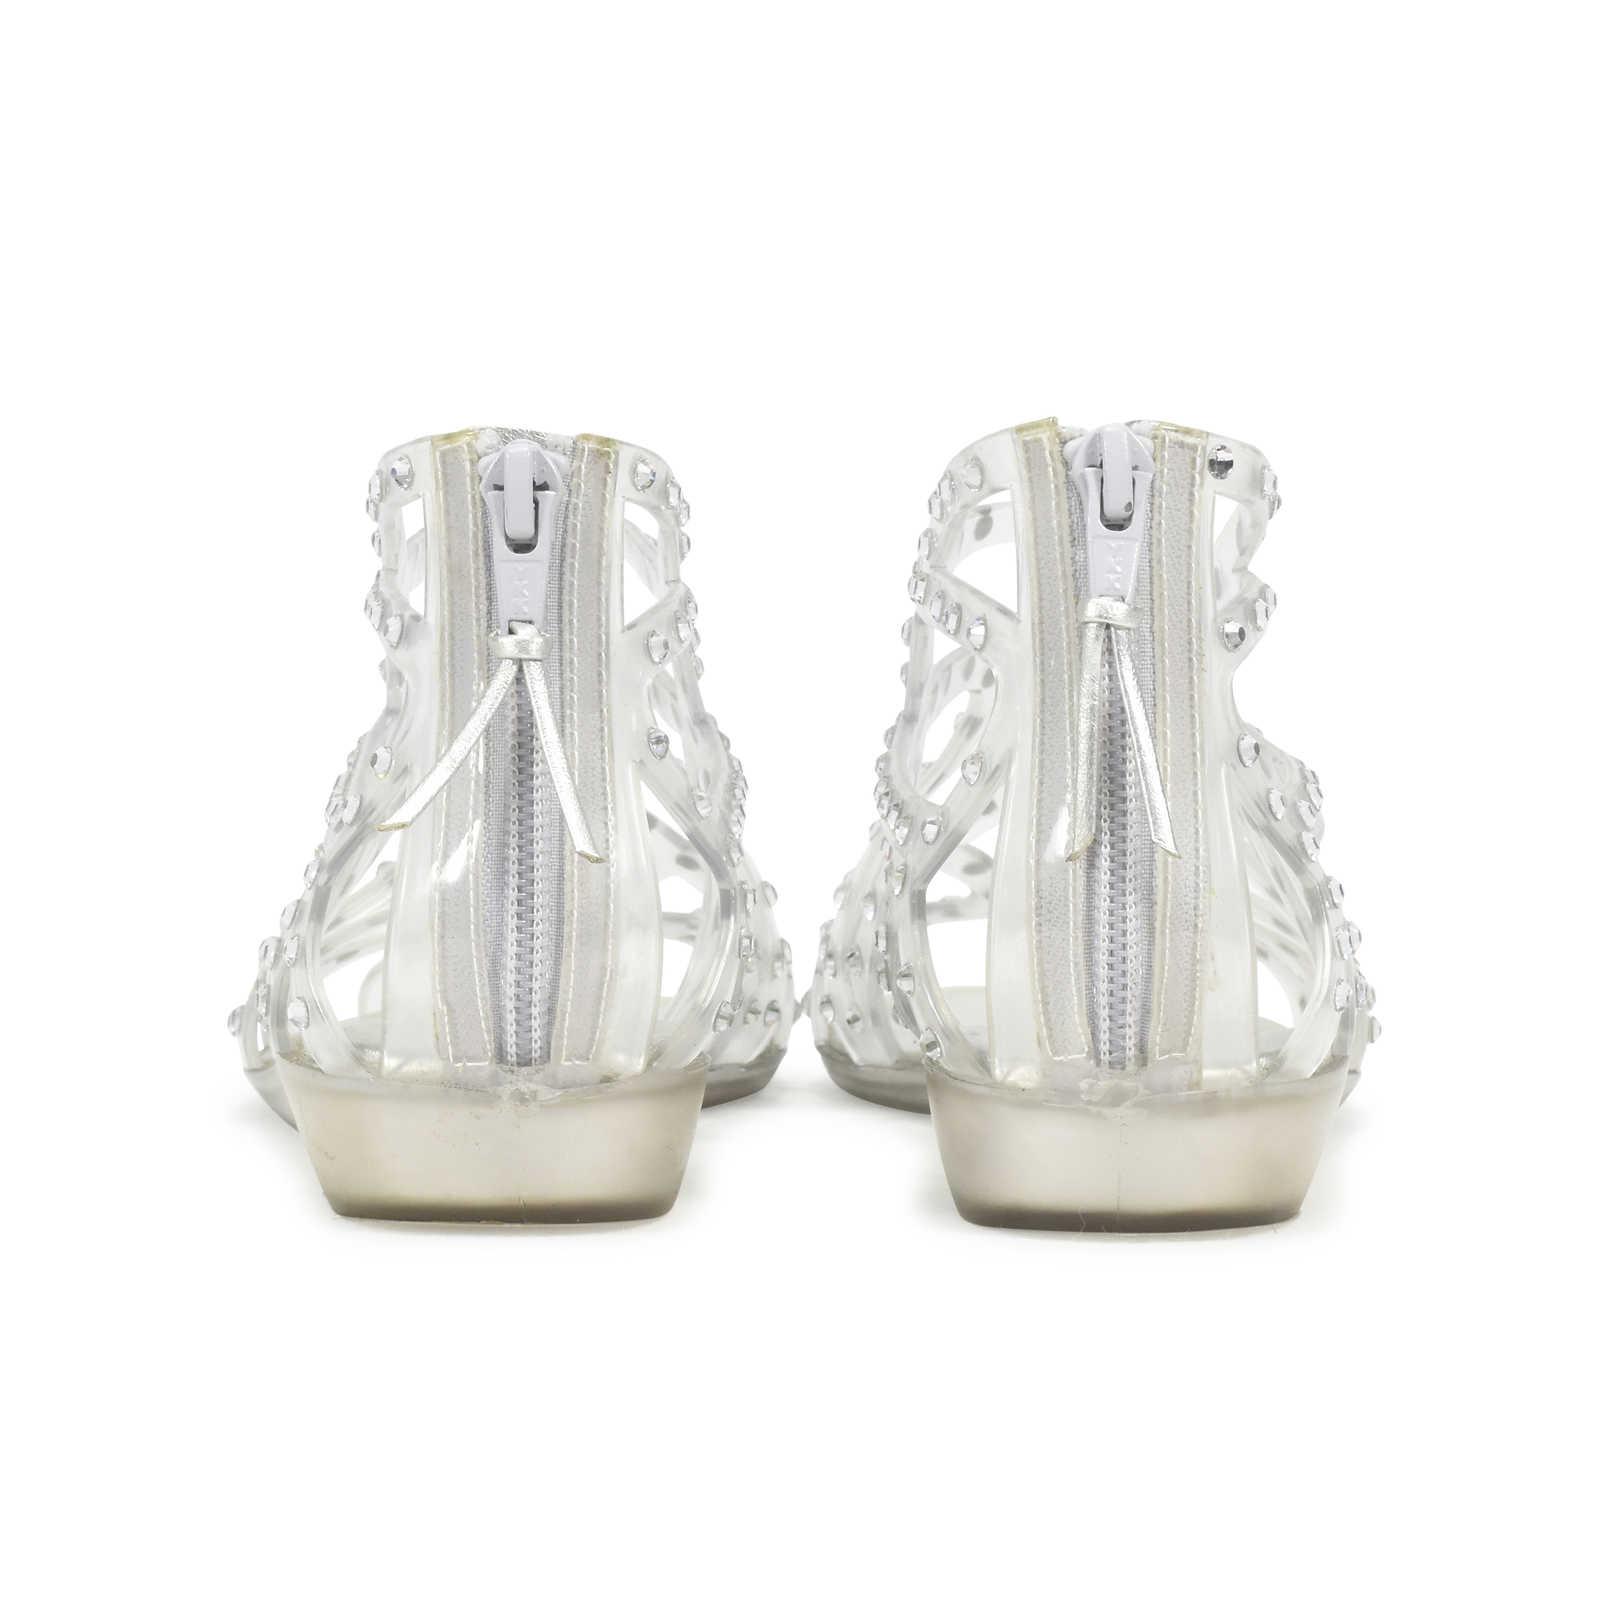 68fba71dbc7f ... Authentic Second Hand Stuart Weitzman Glogladius Caged Crystal Jelly  Sandals (PSS-361-00027 ...